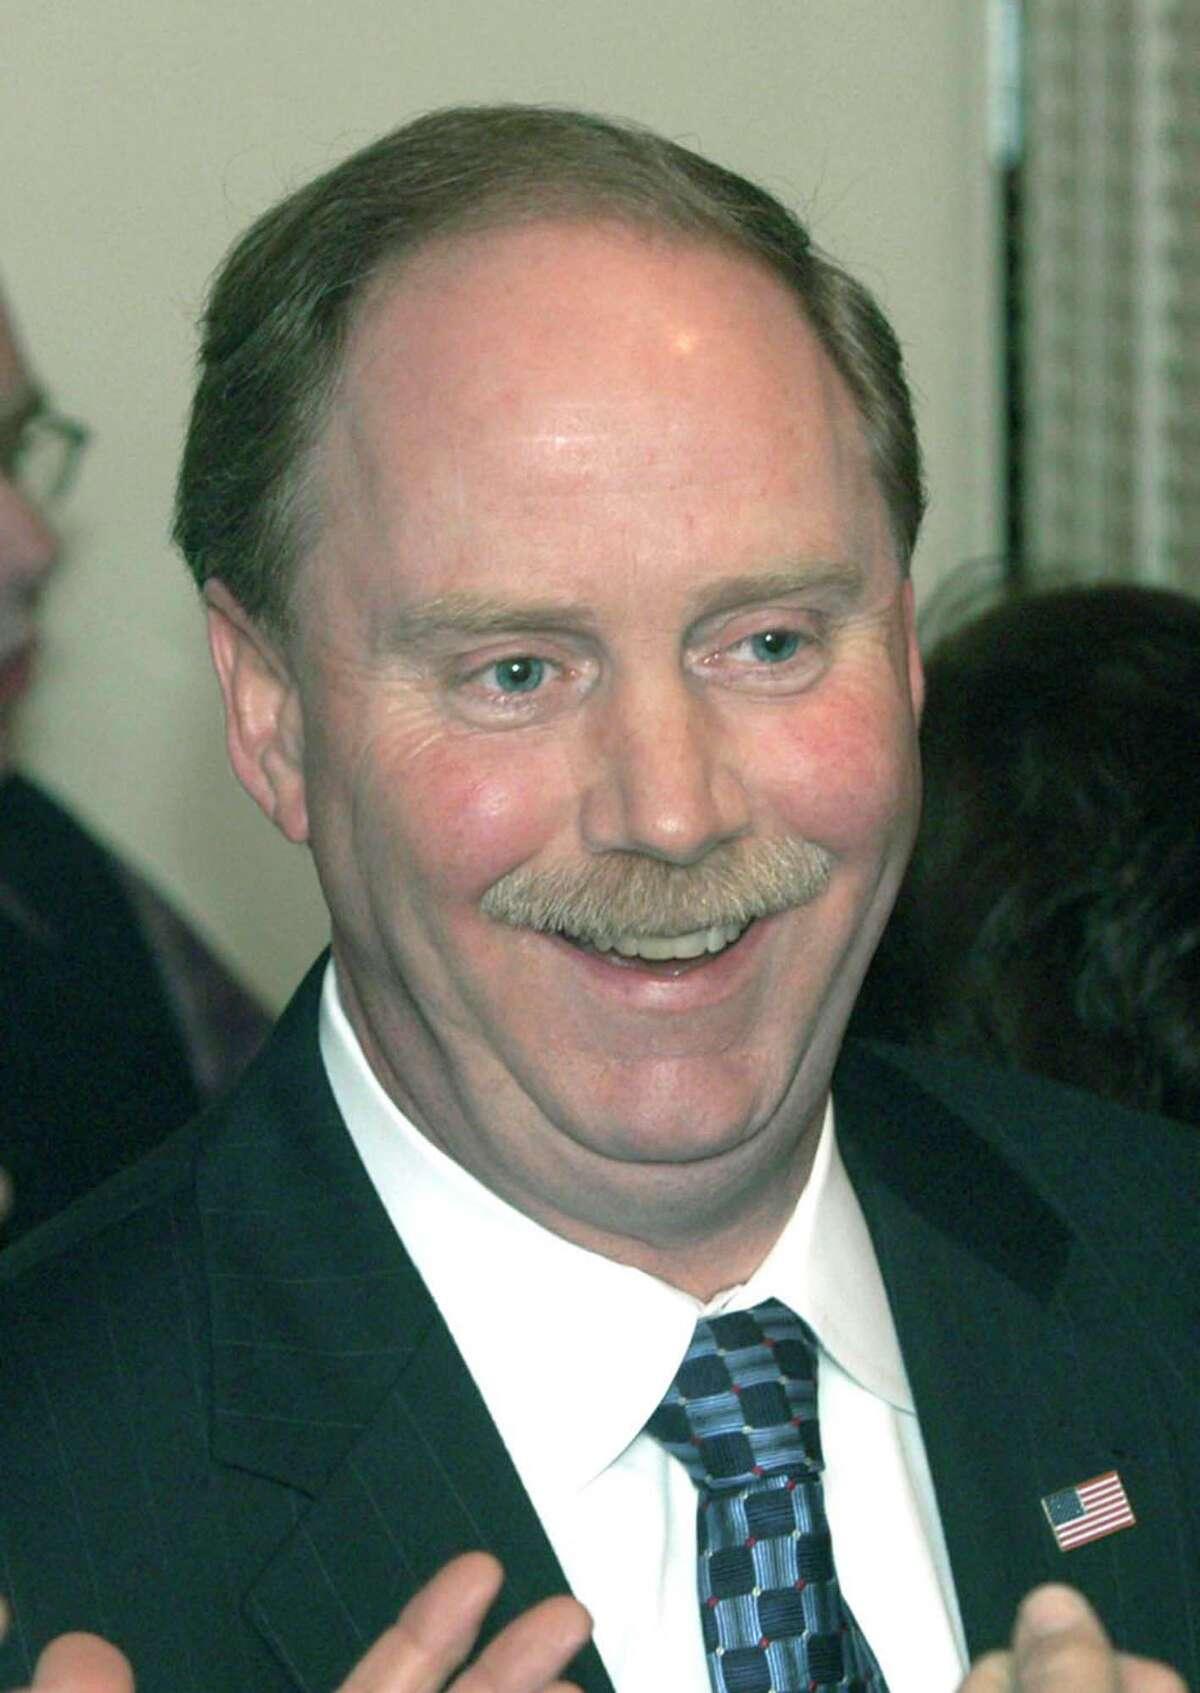 State Senator Michael McLachlan